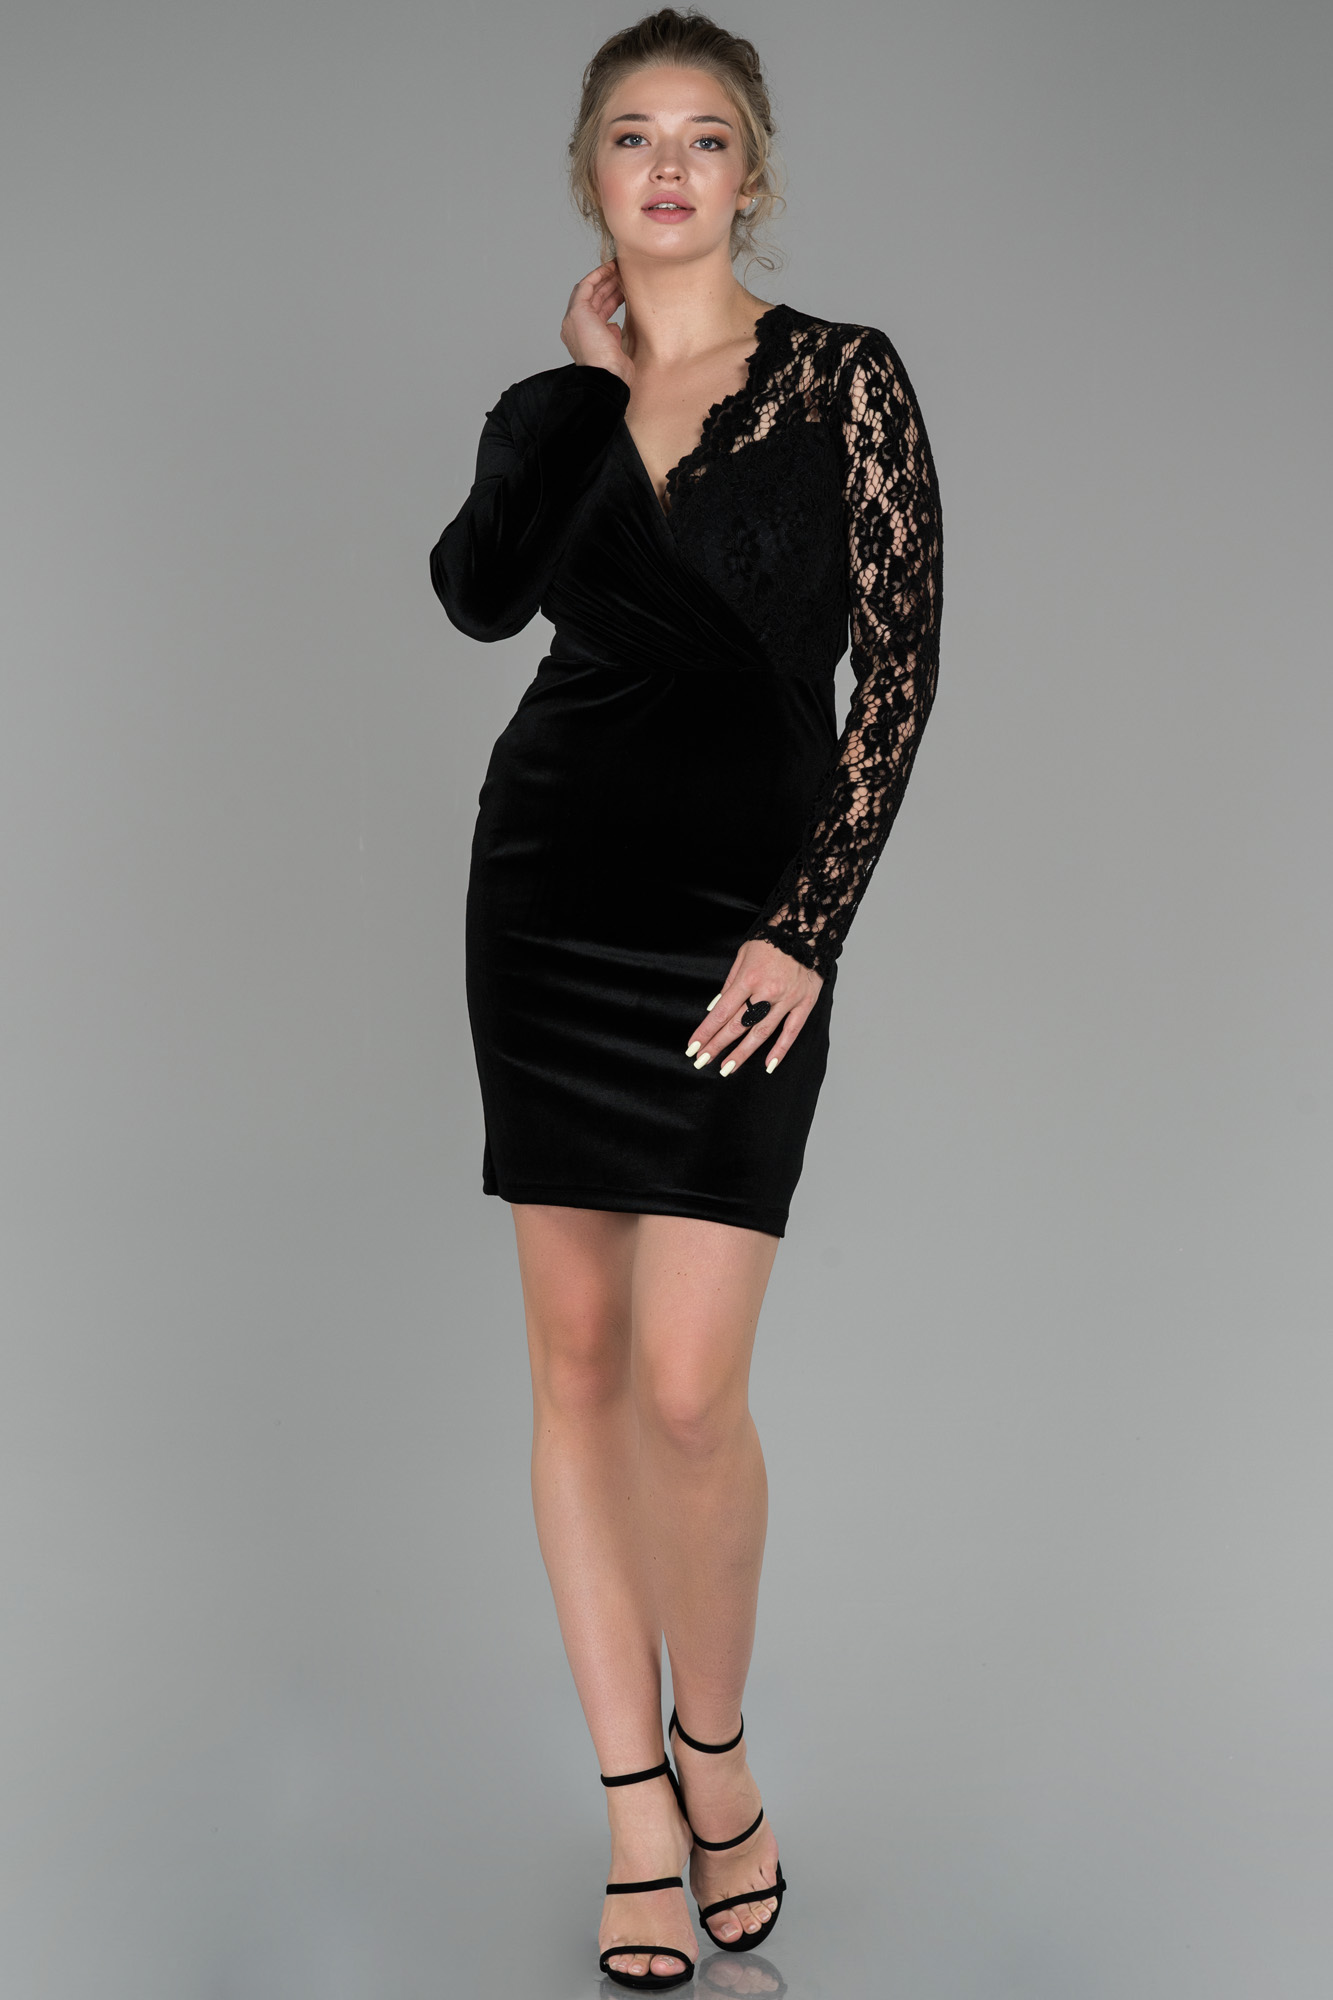 Siyah Kruvaze Yaka Güpürlü Kadife Davet Elbisesi